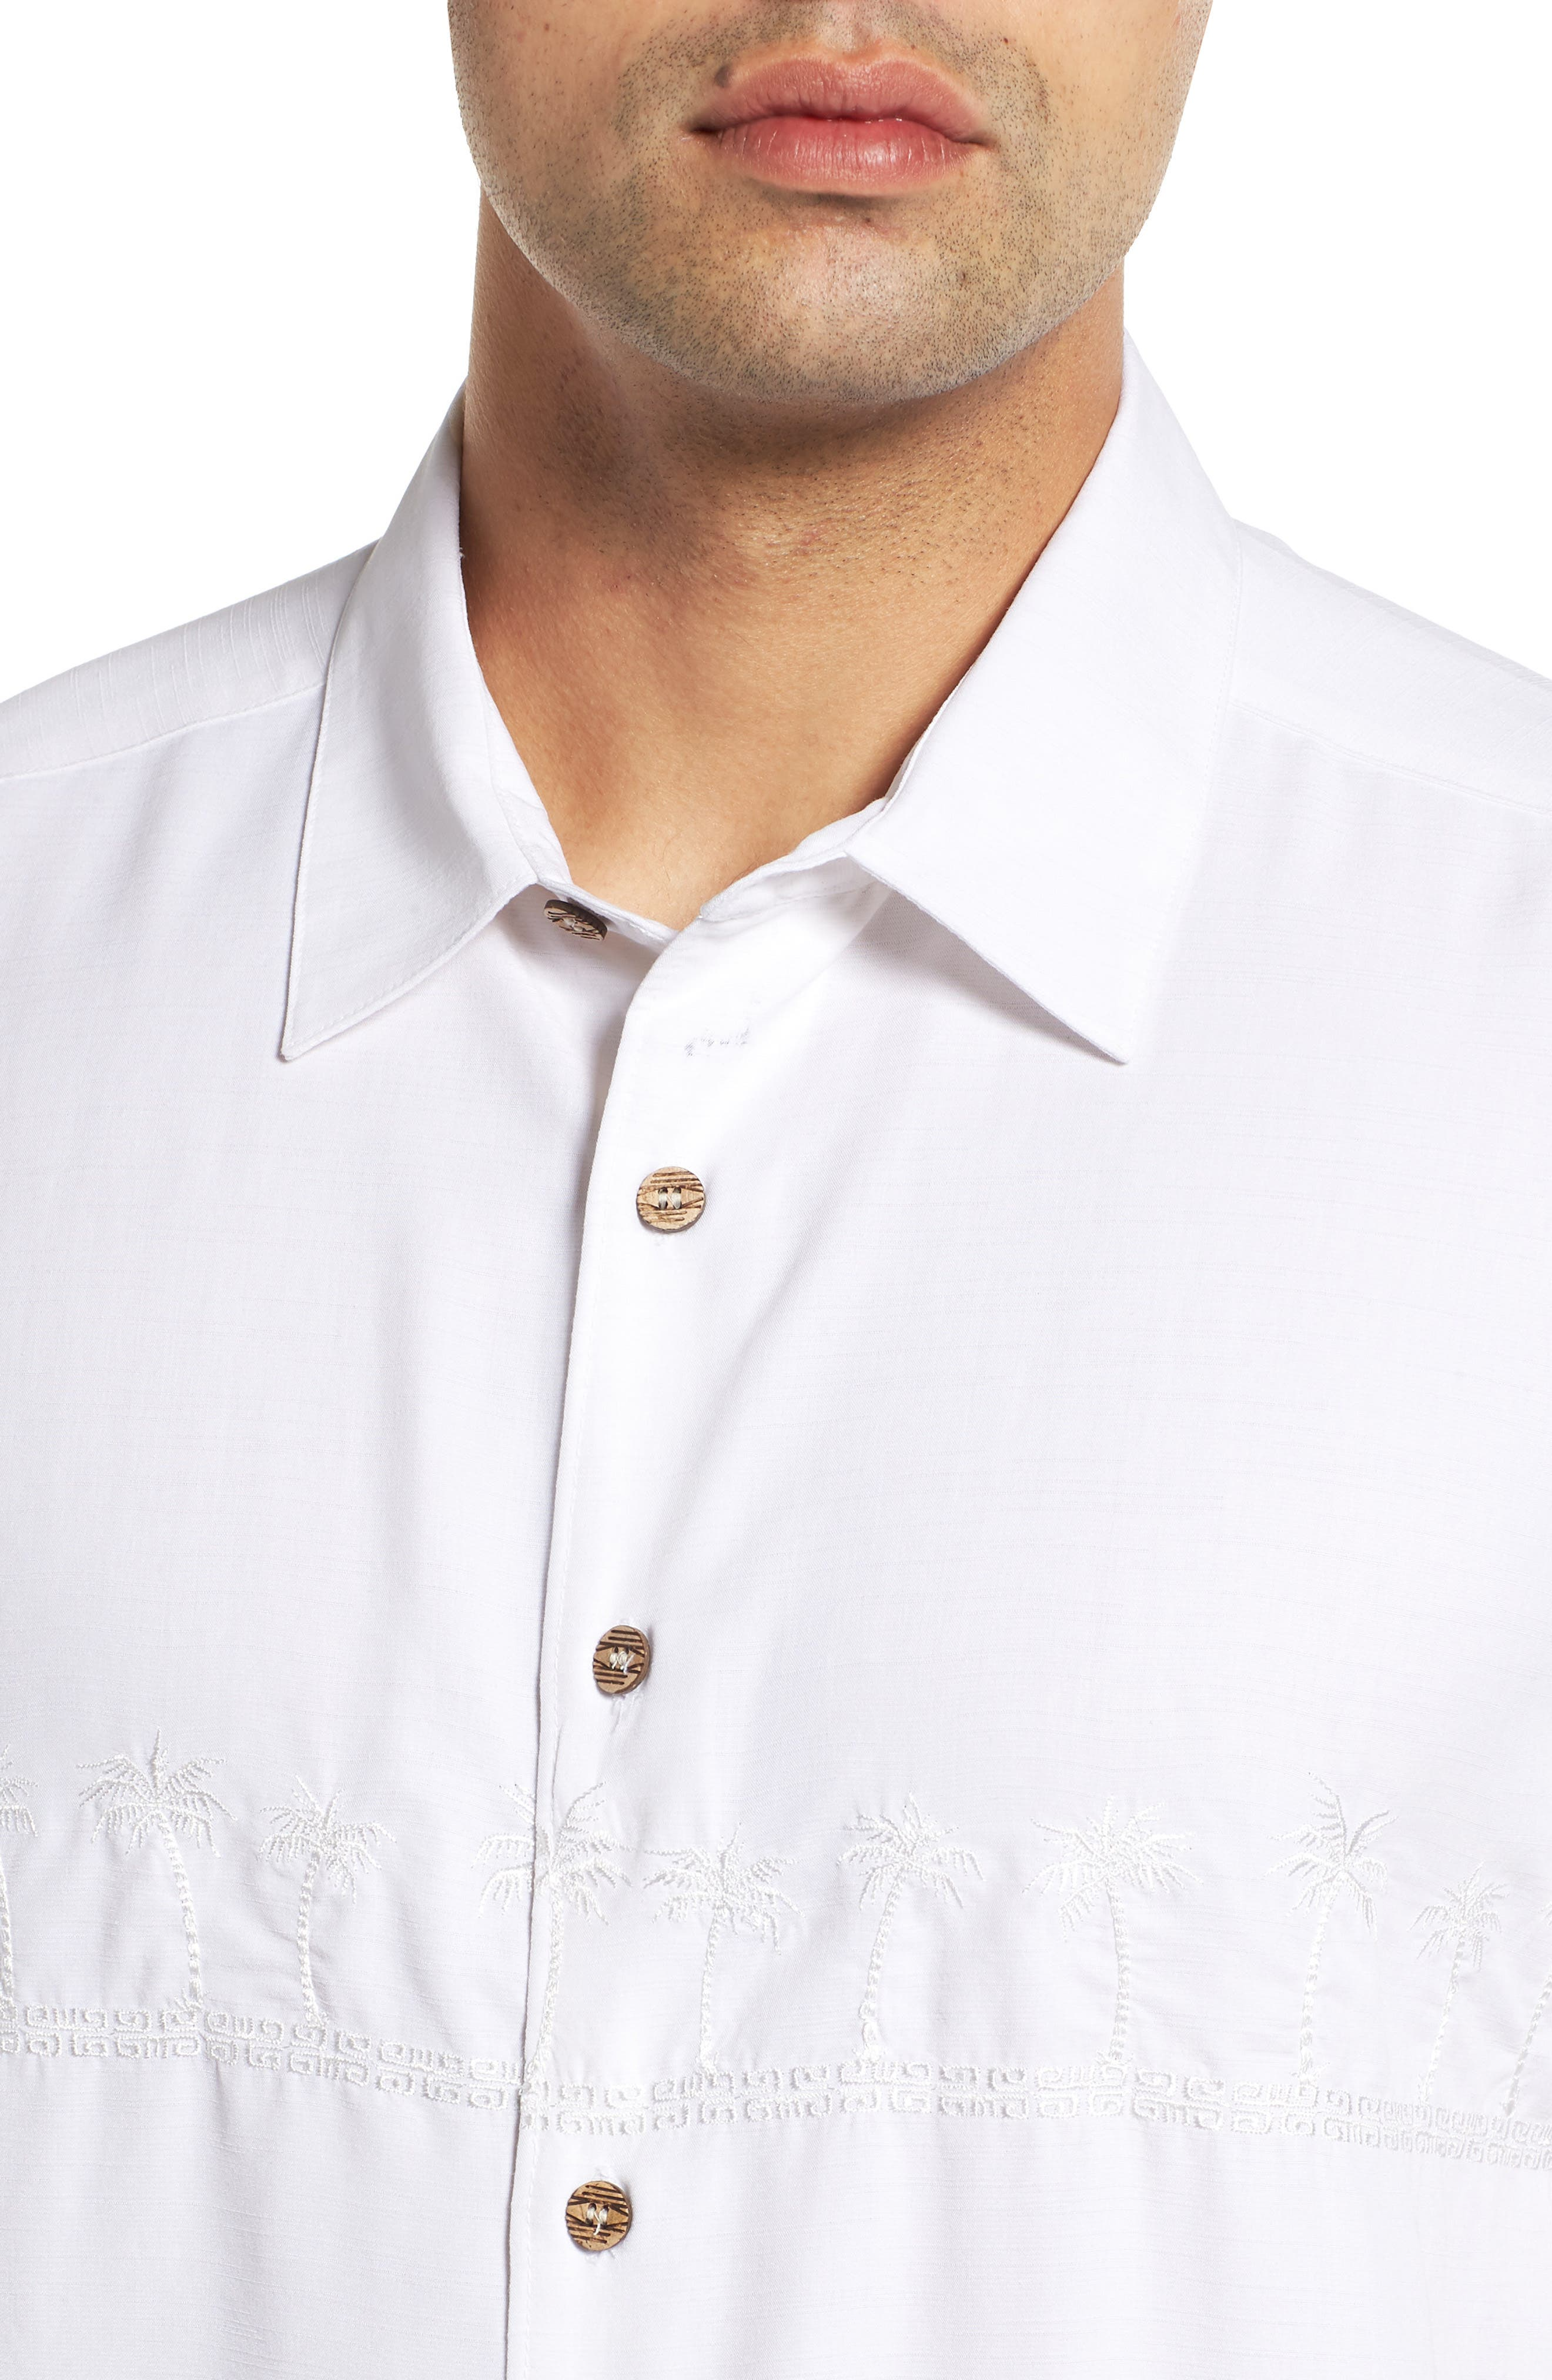 QUIKSILVER WATERMAN COLLECTION,                             Tahiti Palms Regular Fit Sport Shirt,                             Alternate thumbnail 2, color,                             WHITE